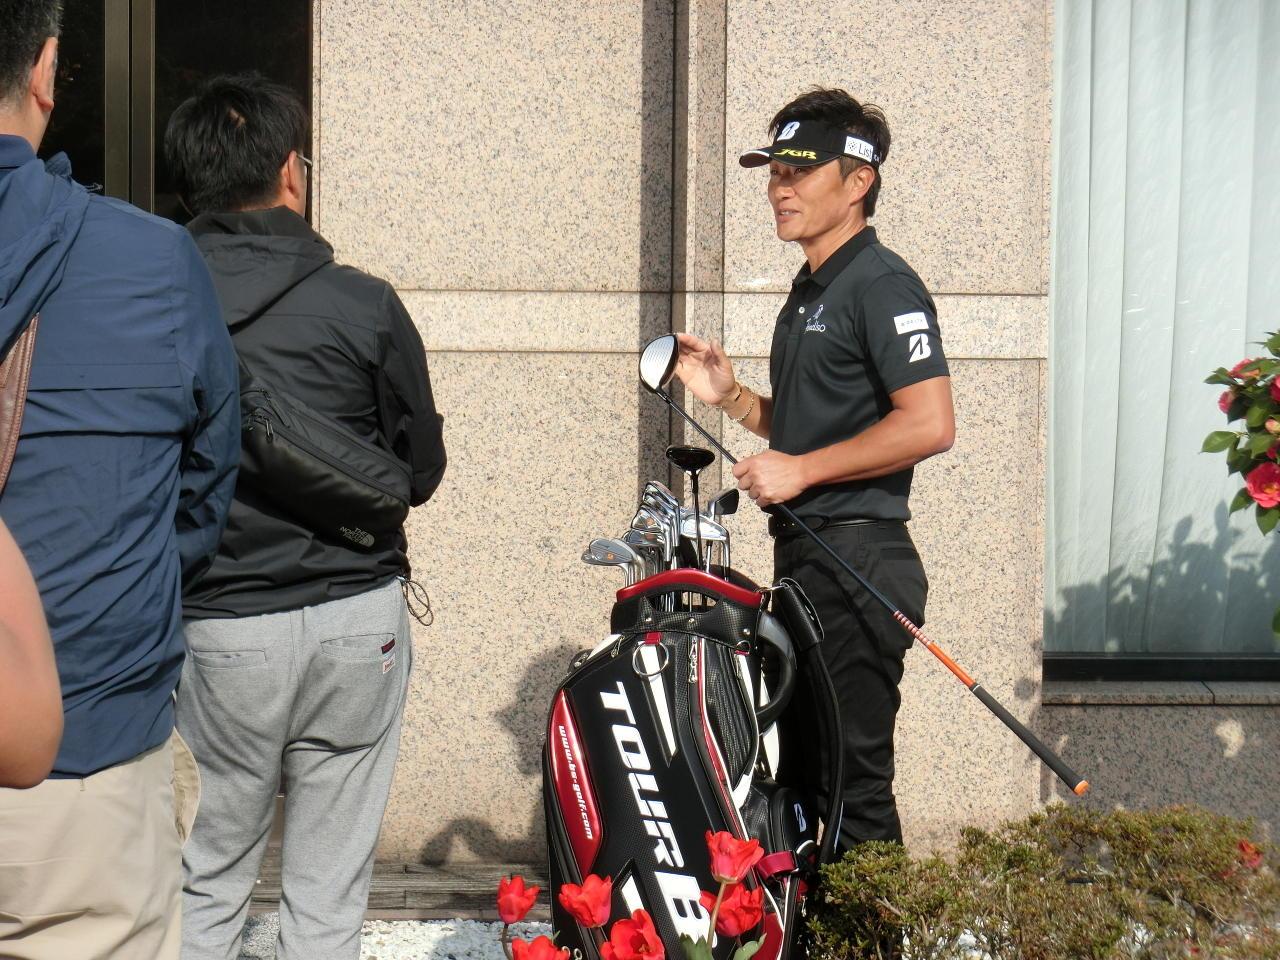 http://www.bs-golf.com/pro/6e2082b826d86b4fa97d21fa61e2790561575970.JPG